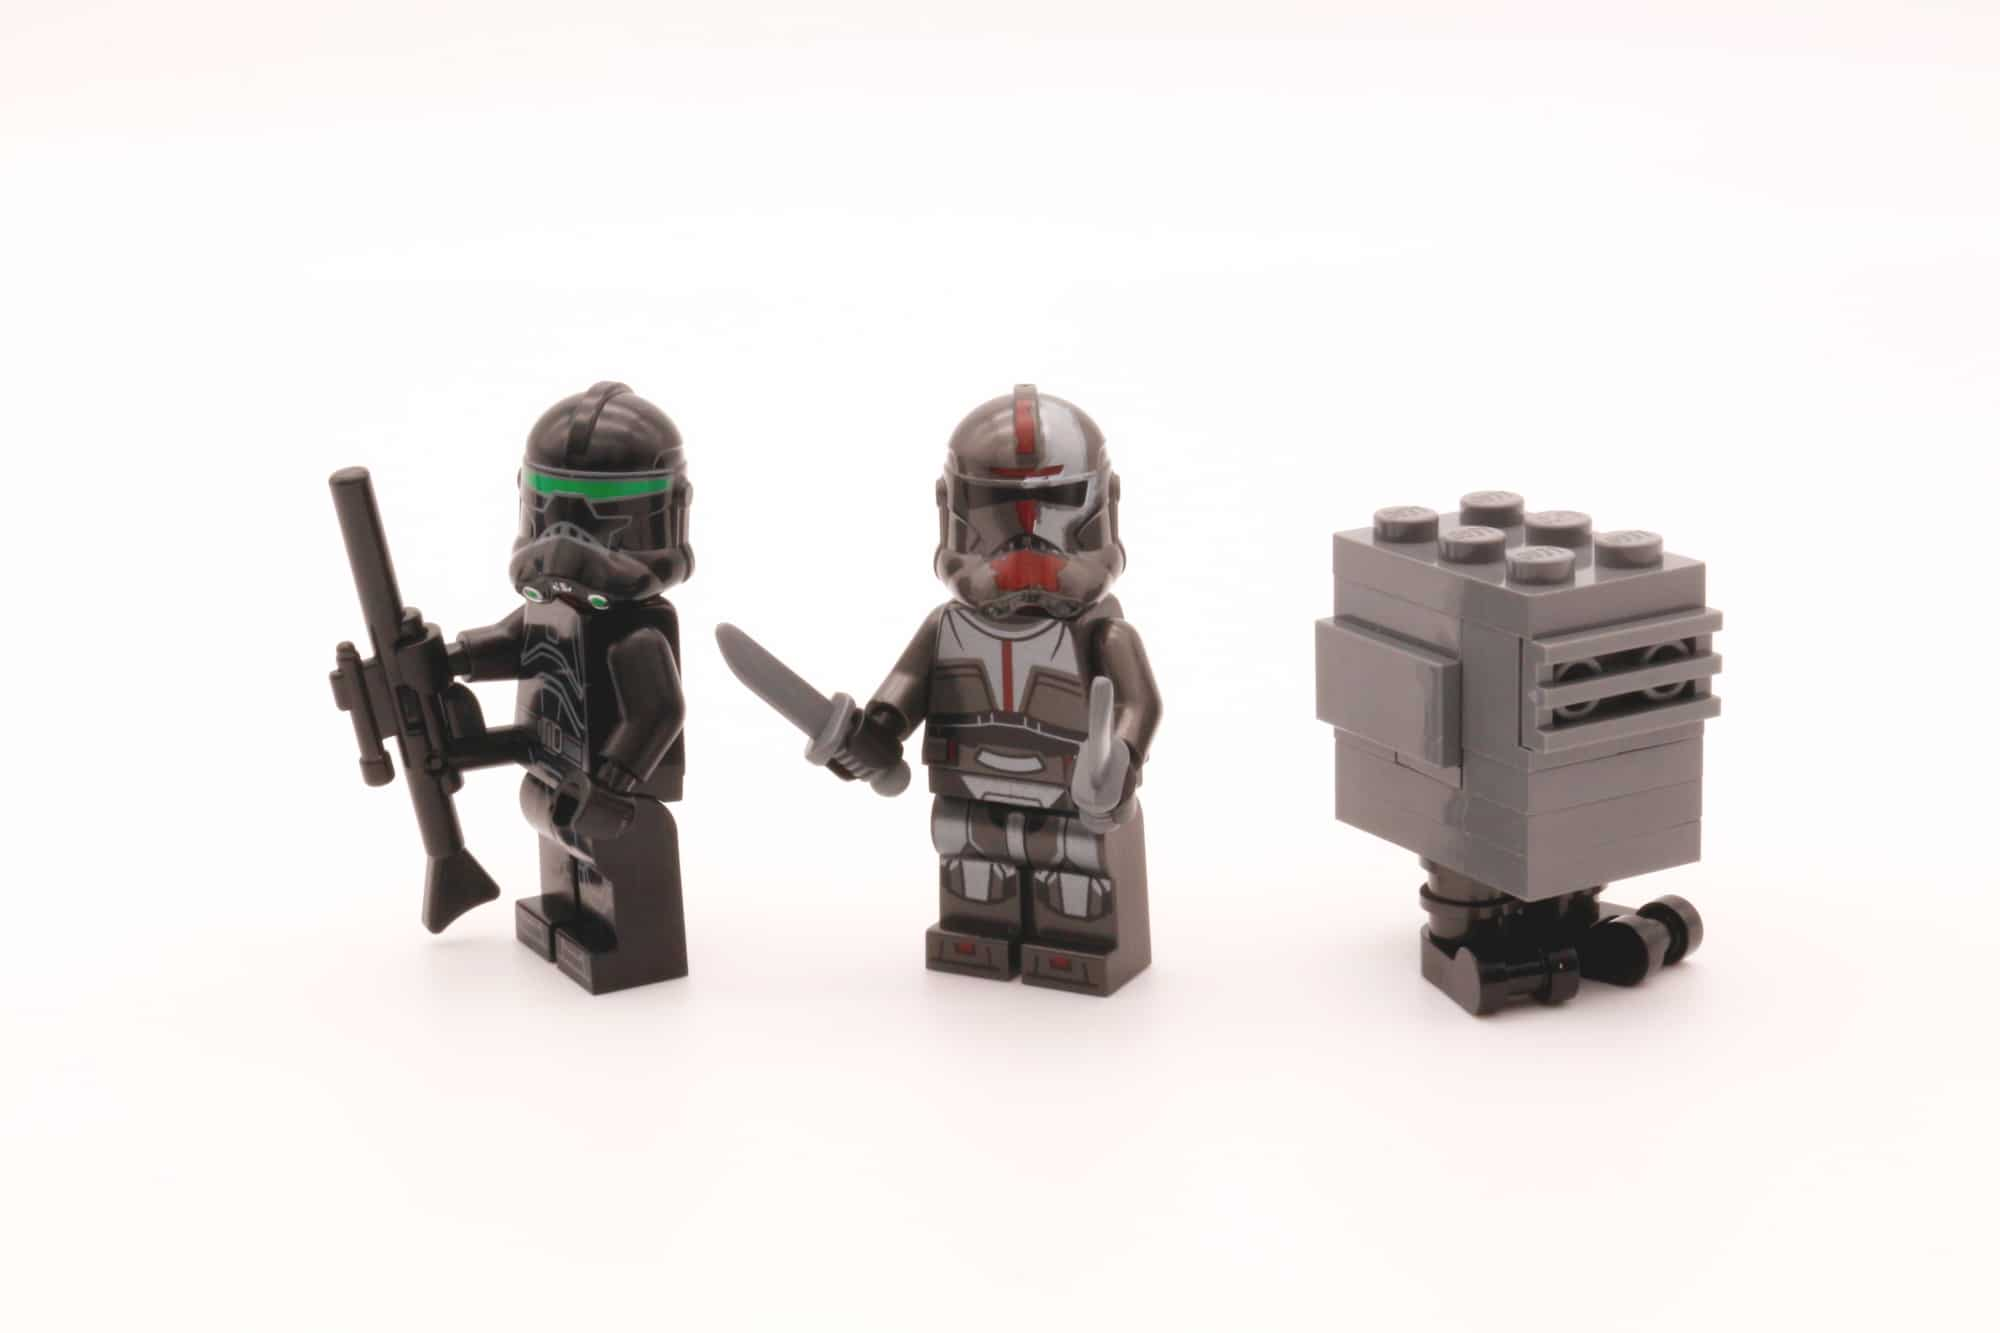 LEGO Star Wars 75314 The Bad Batch Attack Shuttle Bag 1 Minifiguren